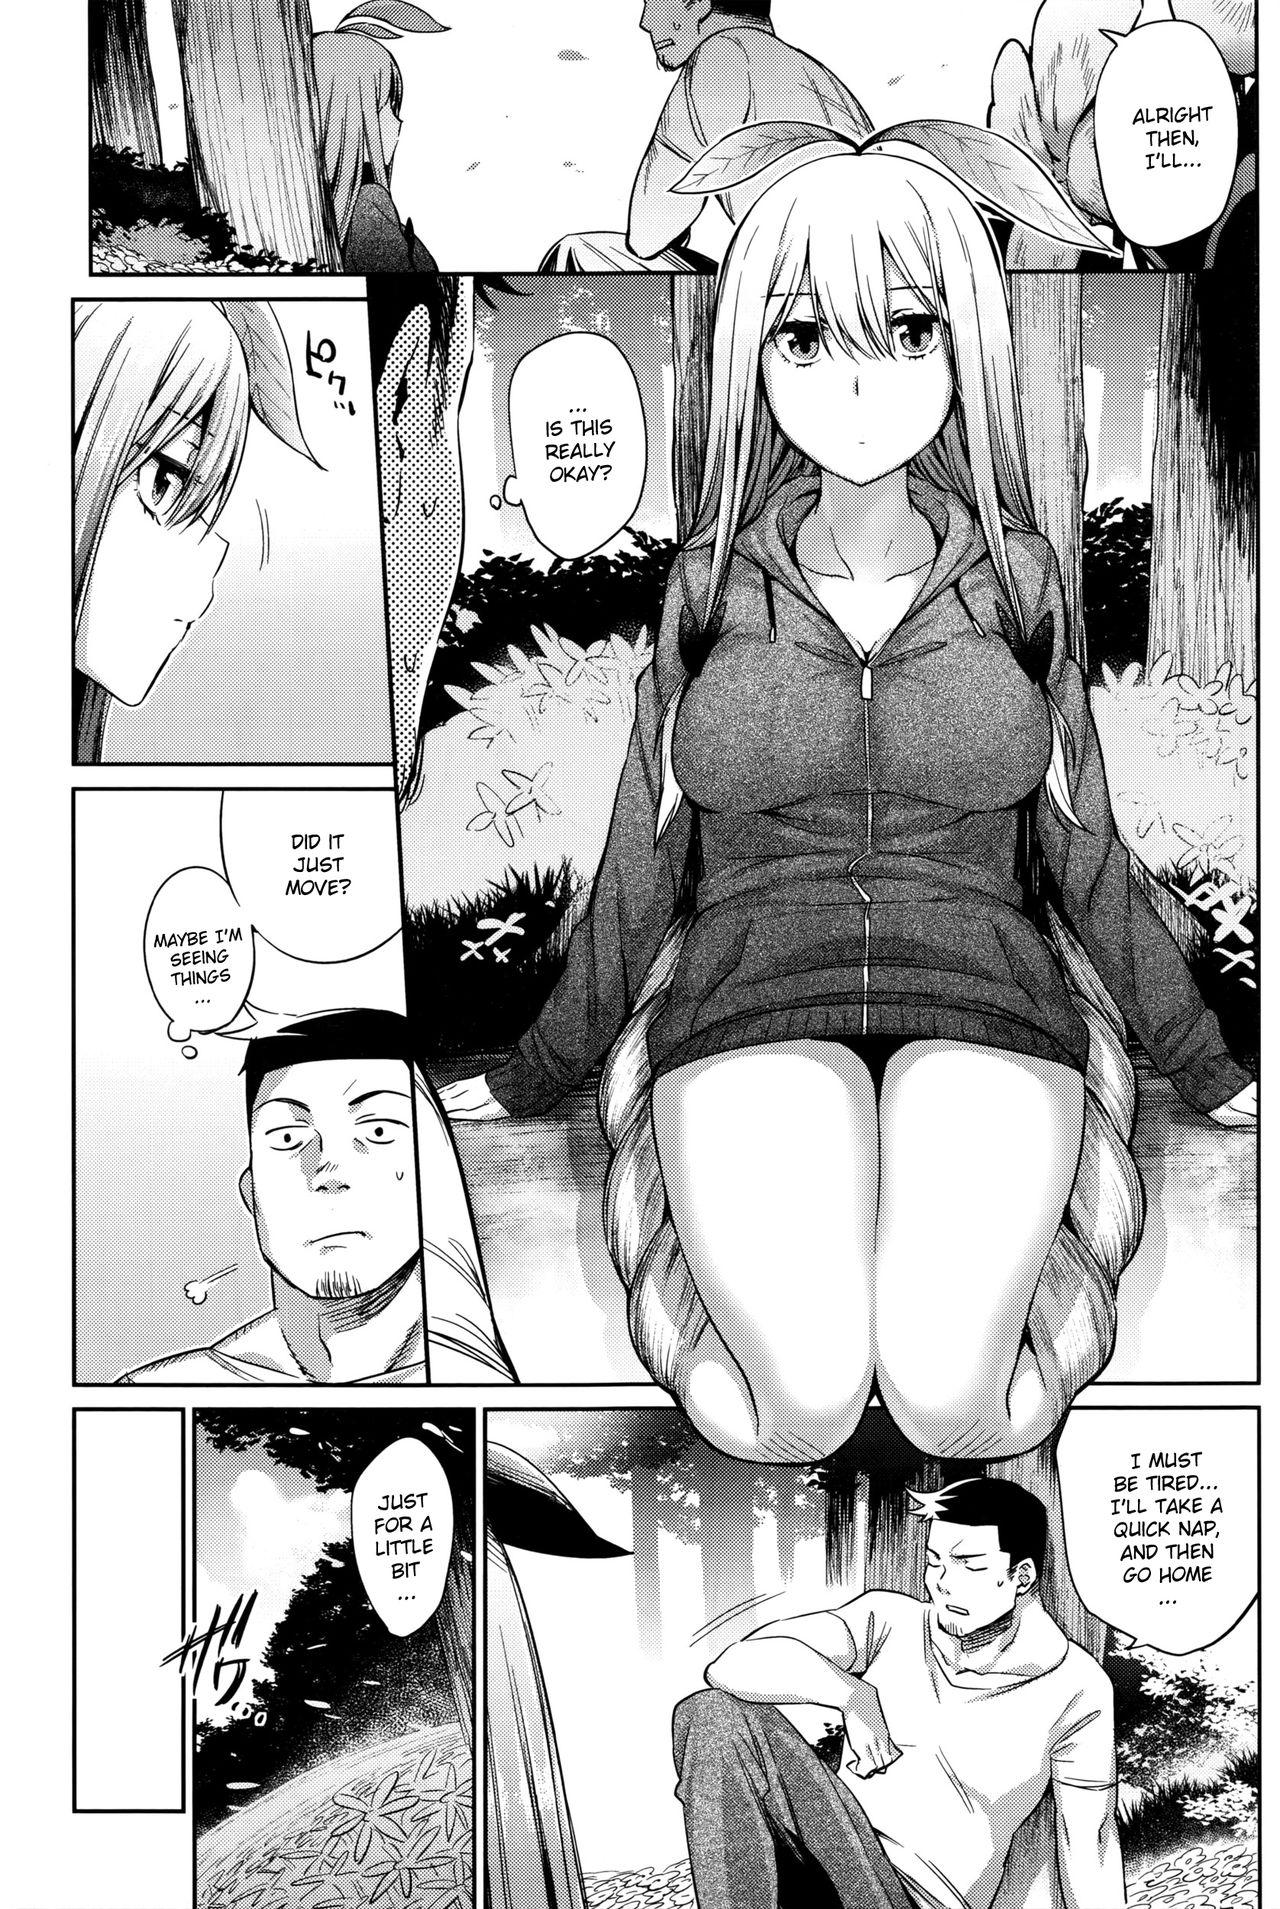 [Mizone] Shokubutsu no Sodatekata - How to raise plants (COMIC BAVEL 2016-04) [English] [InsanePraetor+4chanH] 8